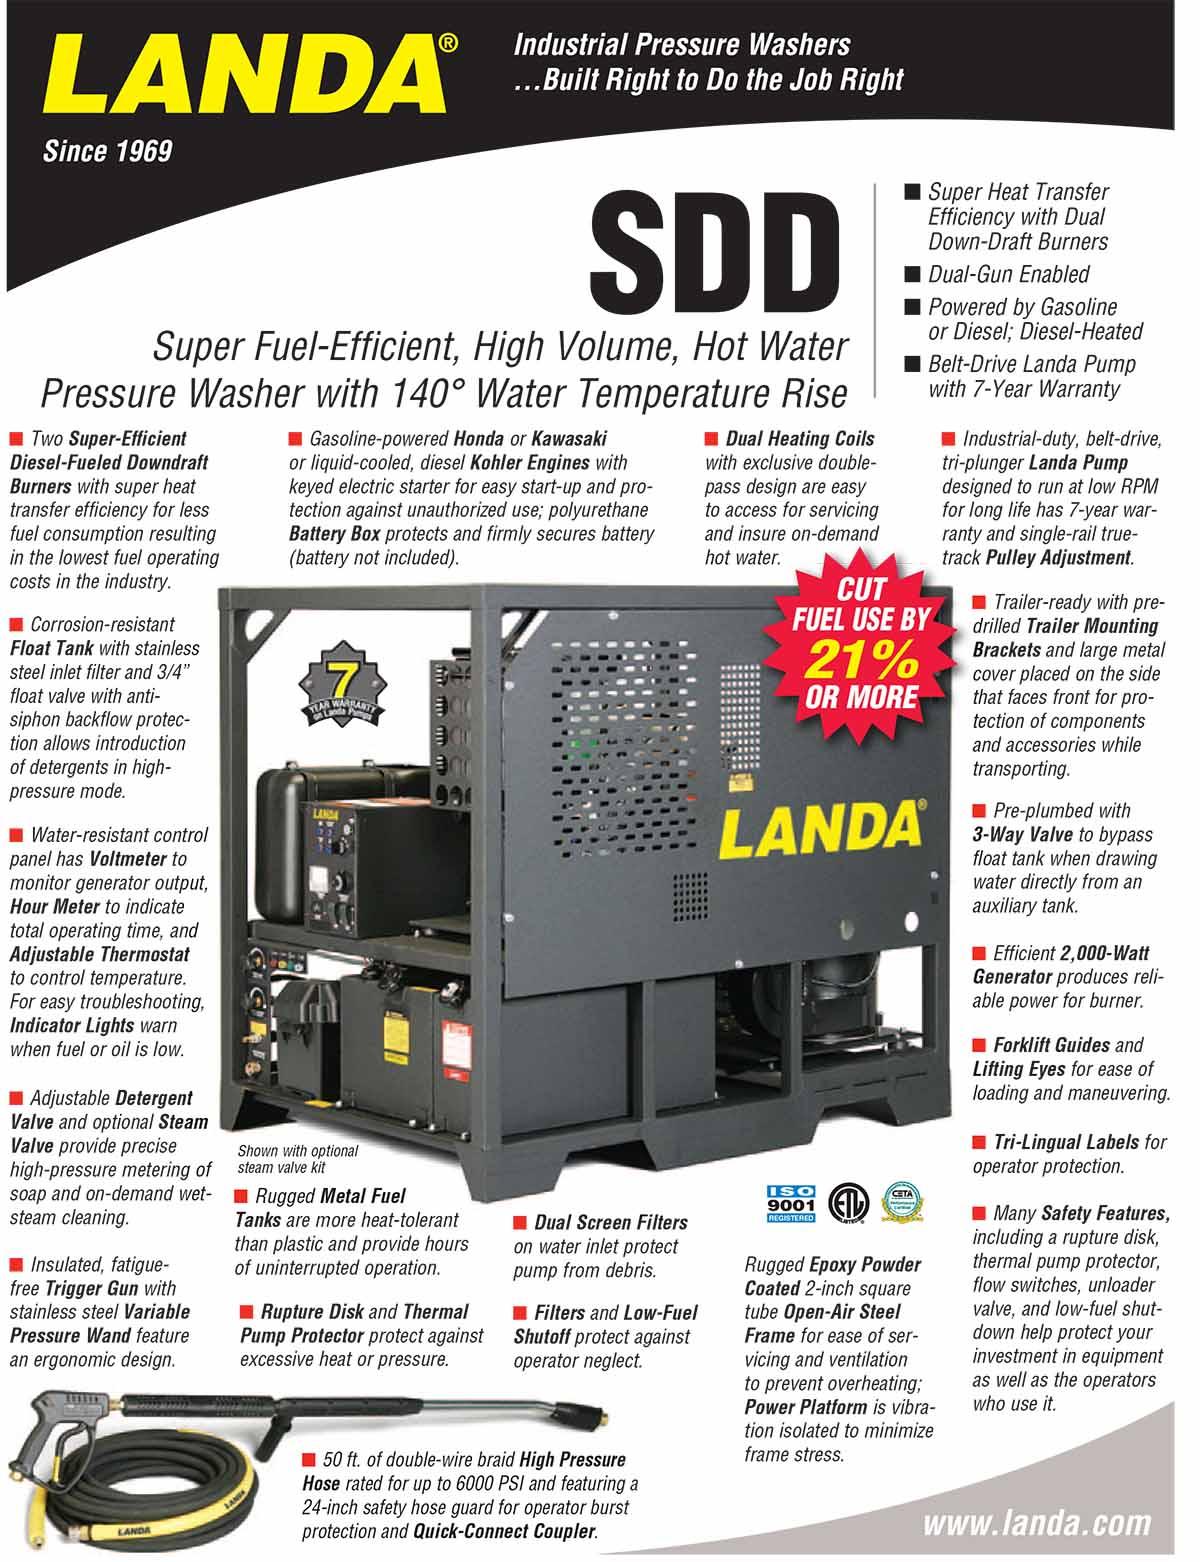 LANDA SDD Product Flyer